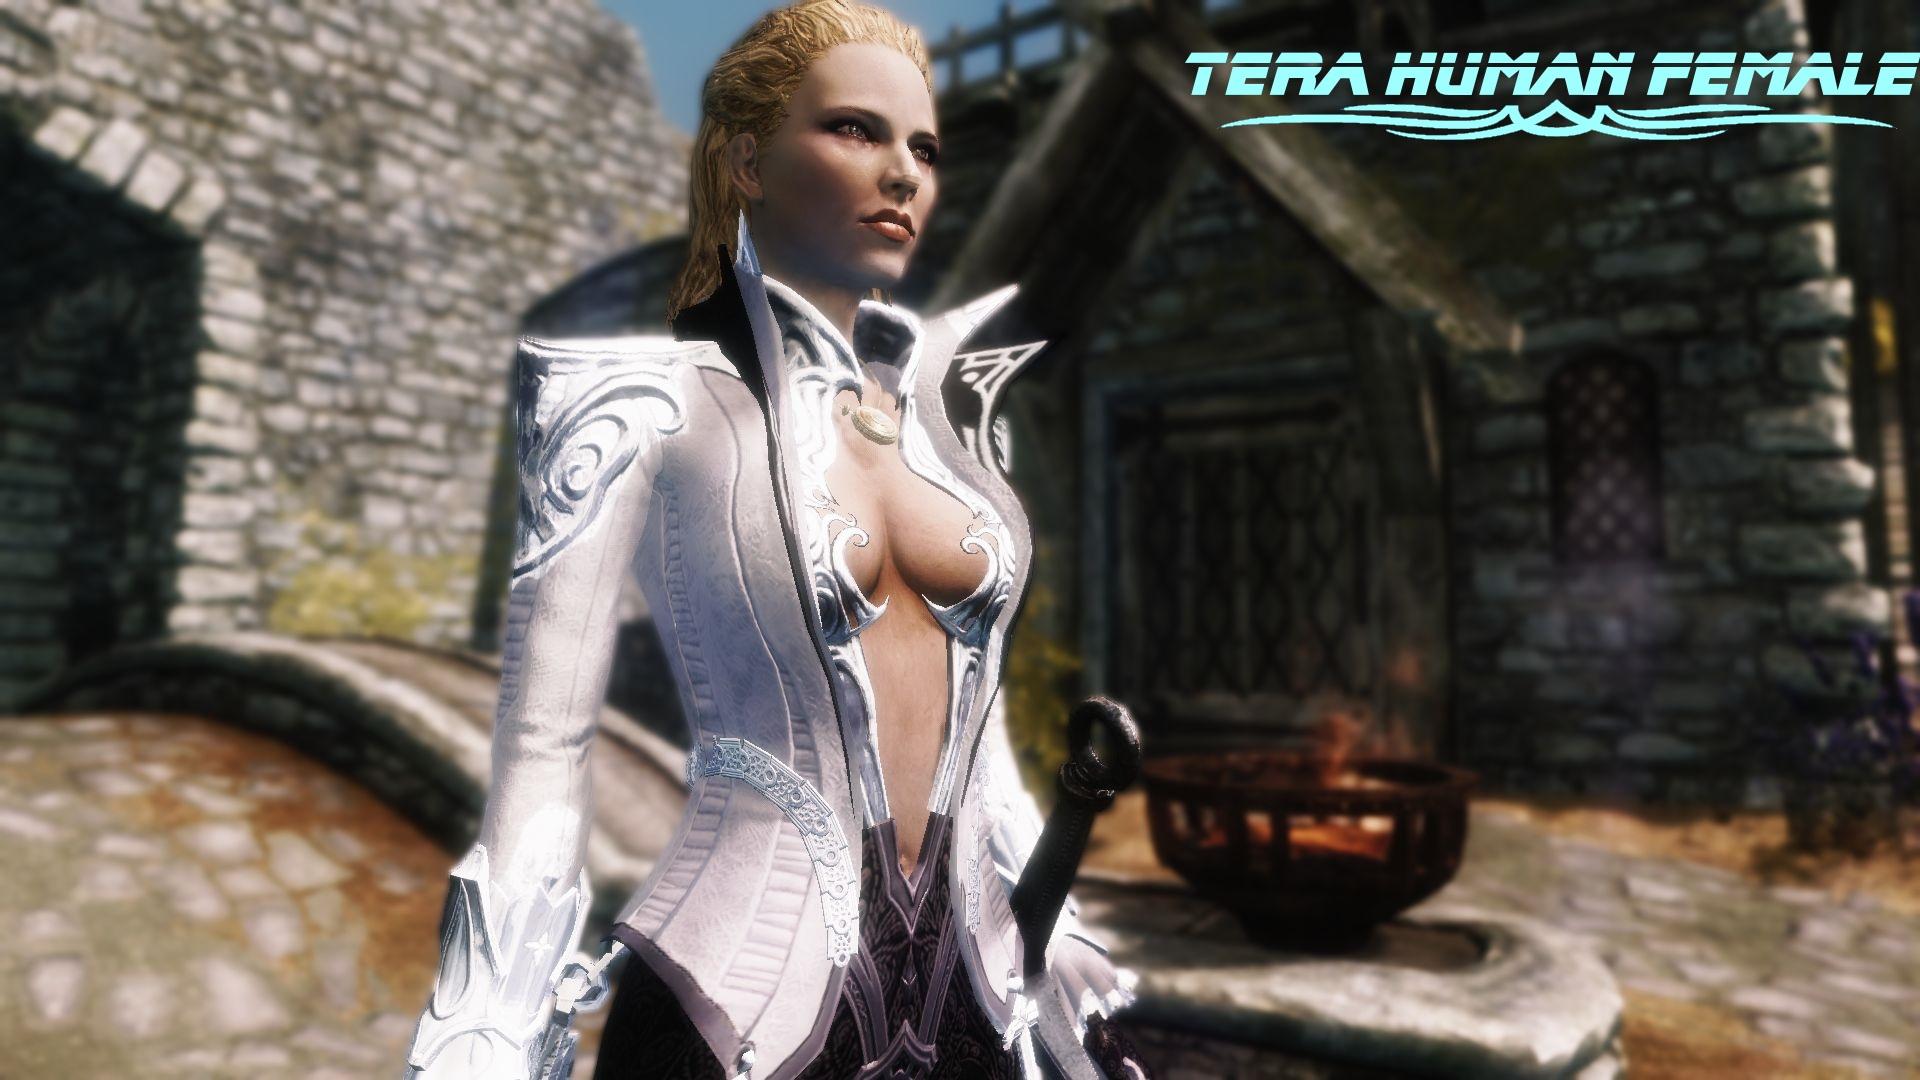 Tera_Human_Female.jpg